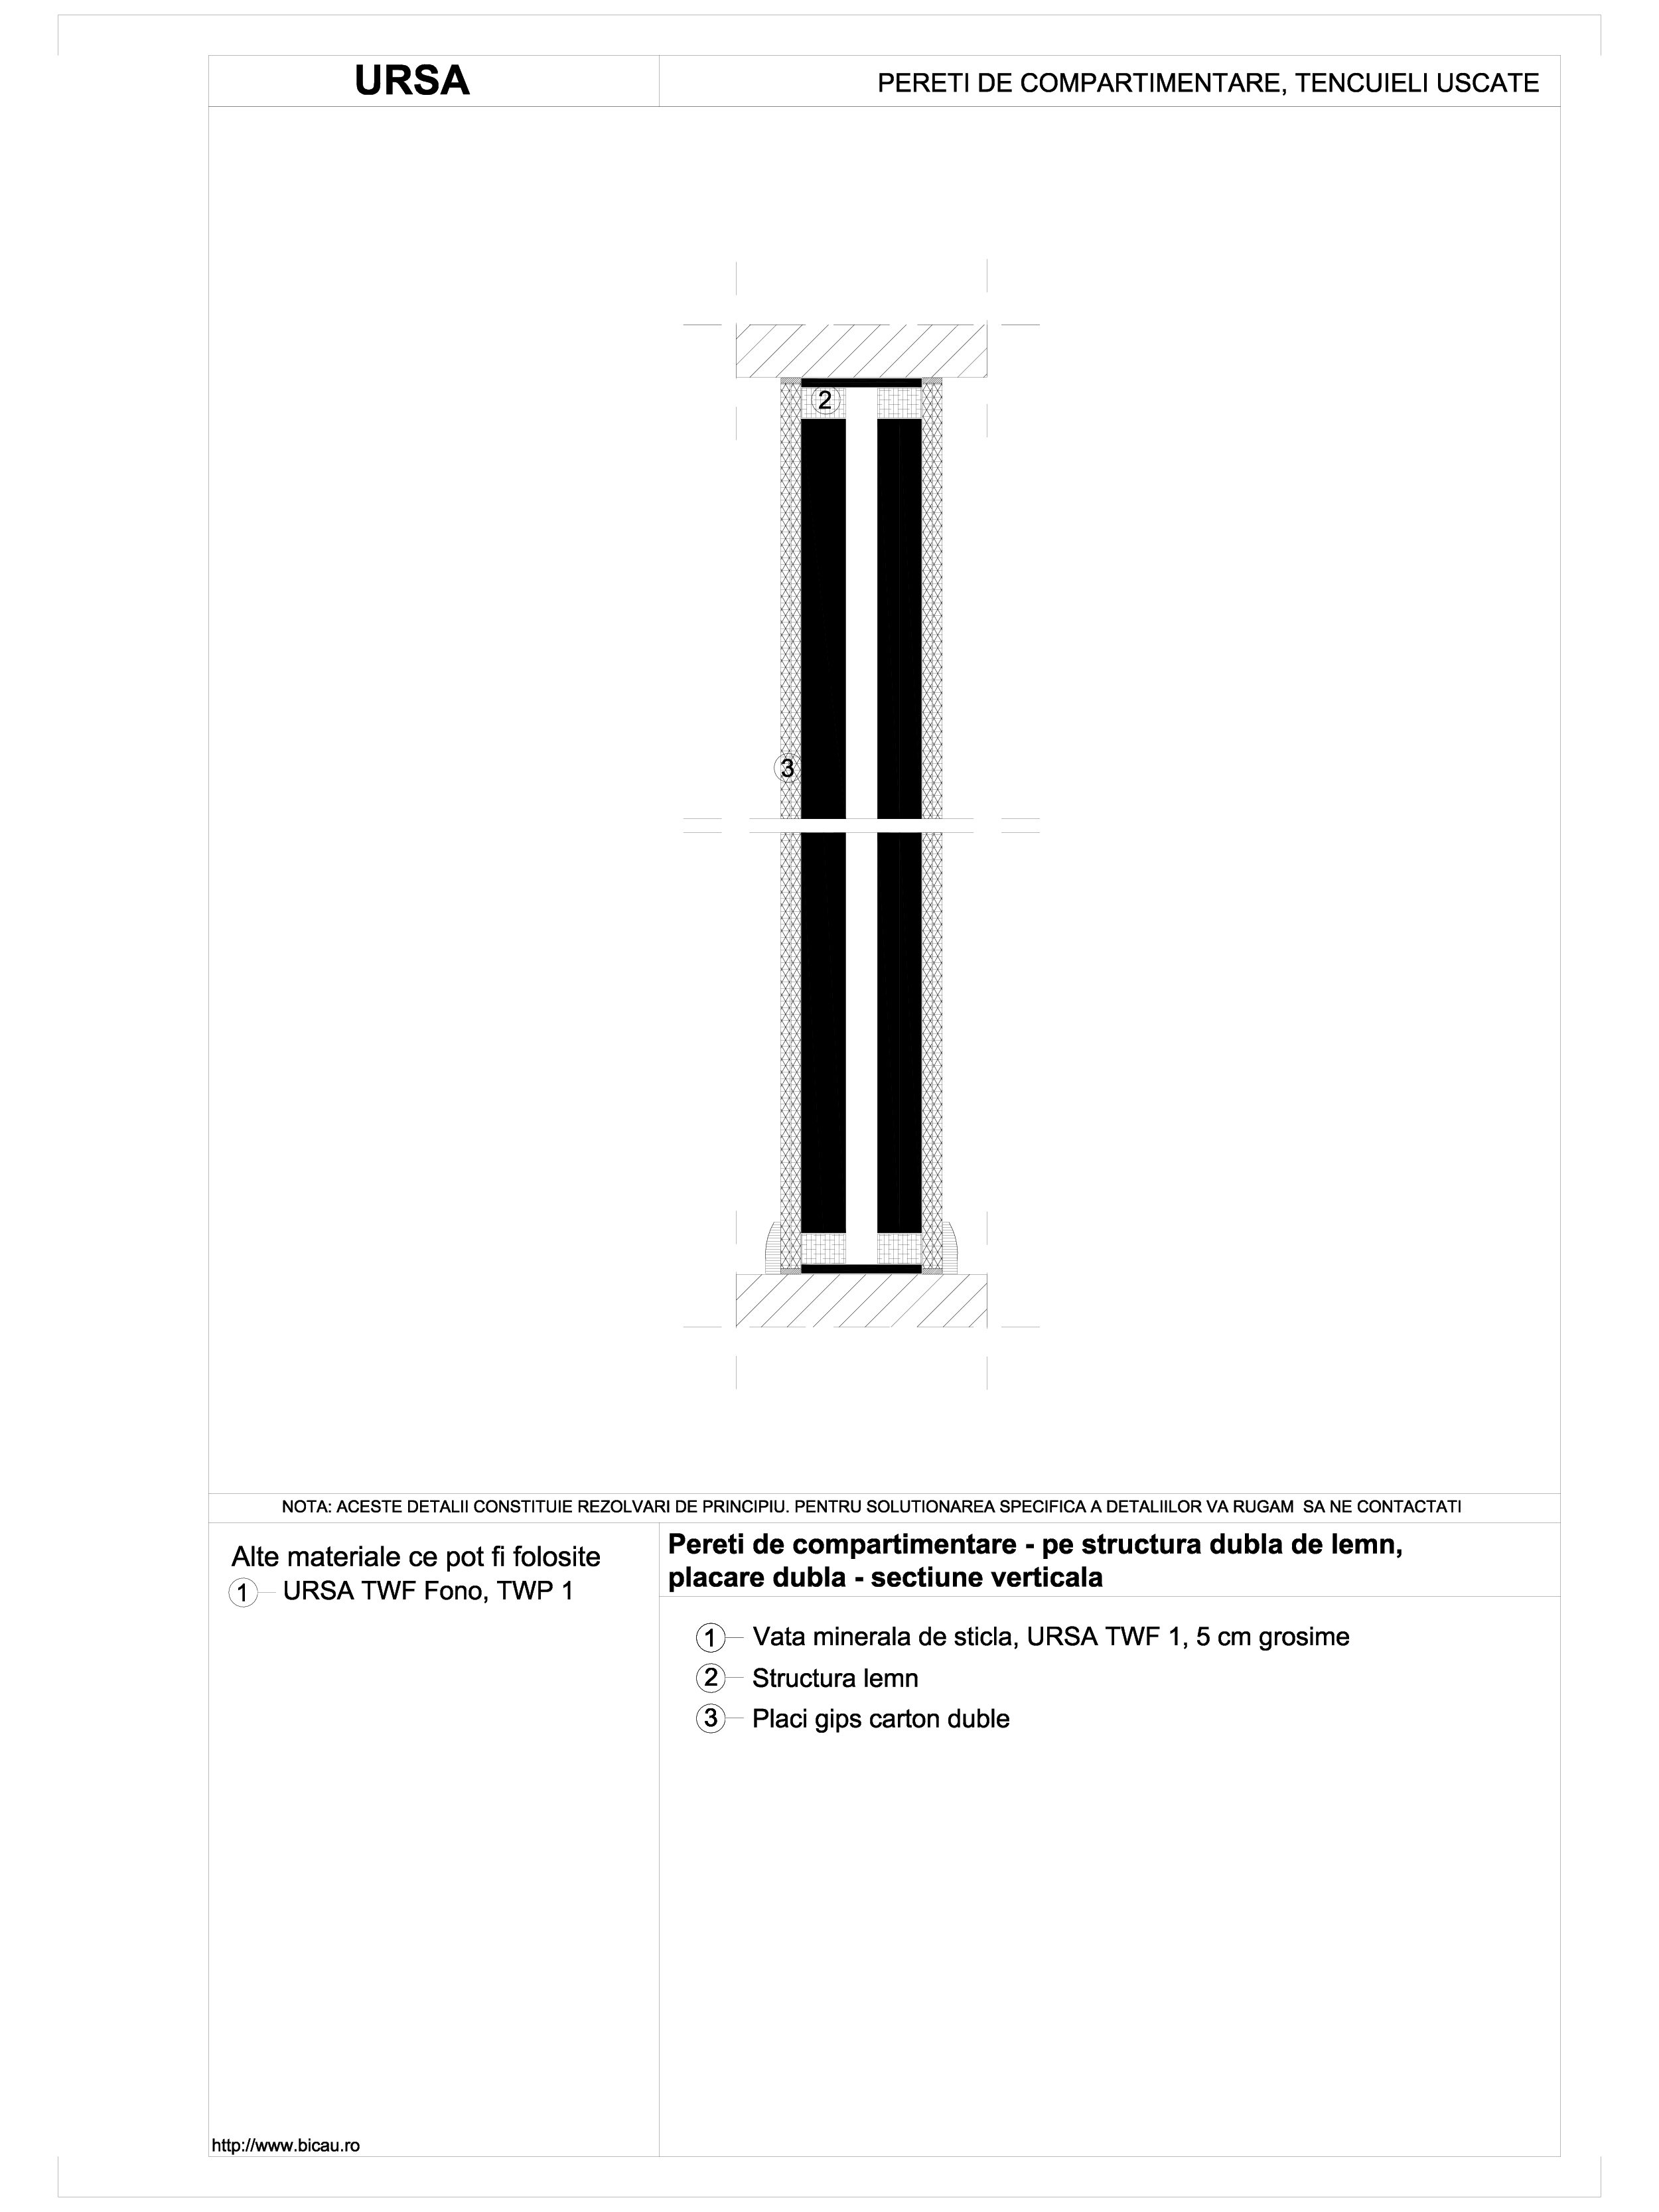 Pereti de compartimentare - pe structura dubla de lemn, placare dubla - sectiune verticala TWF FONO URSA Vata minerala pentru pereti de compartimentare URSA ROMANIA   - Pagina 1